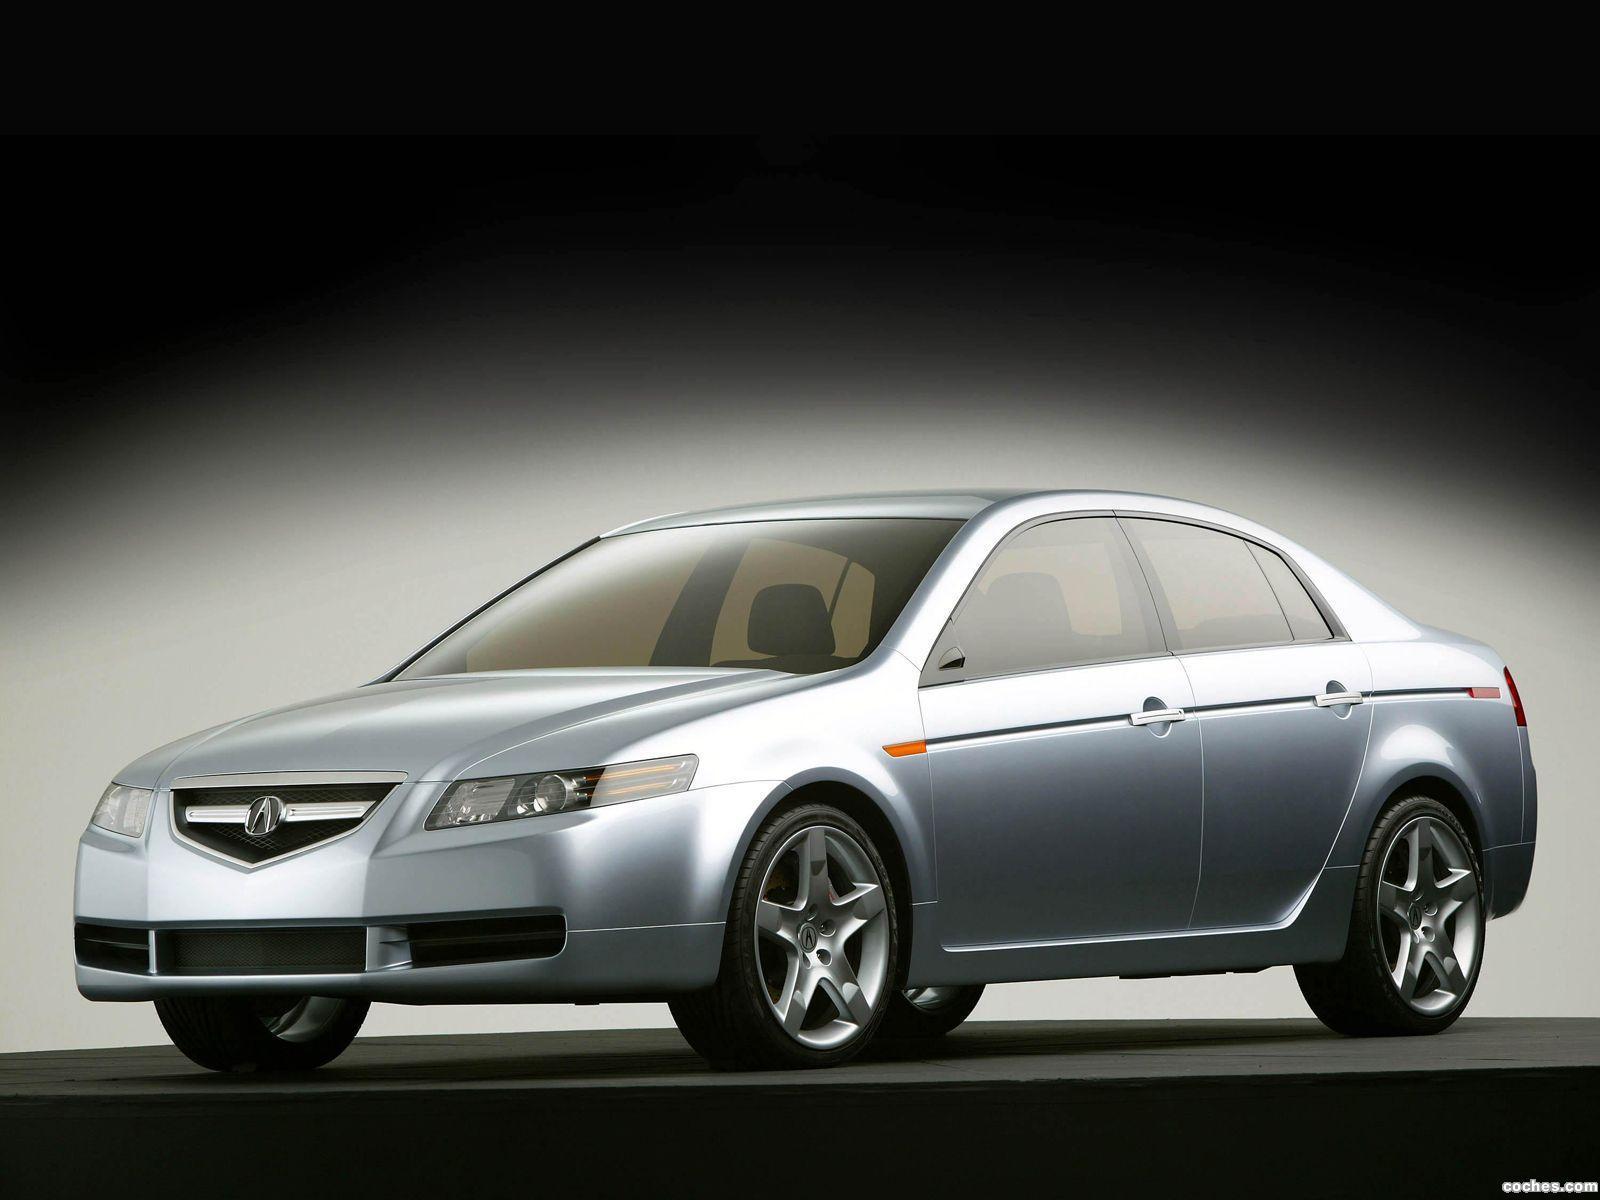 Foto 12 de Acura TL Concept 2003